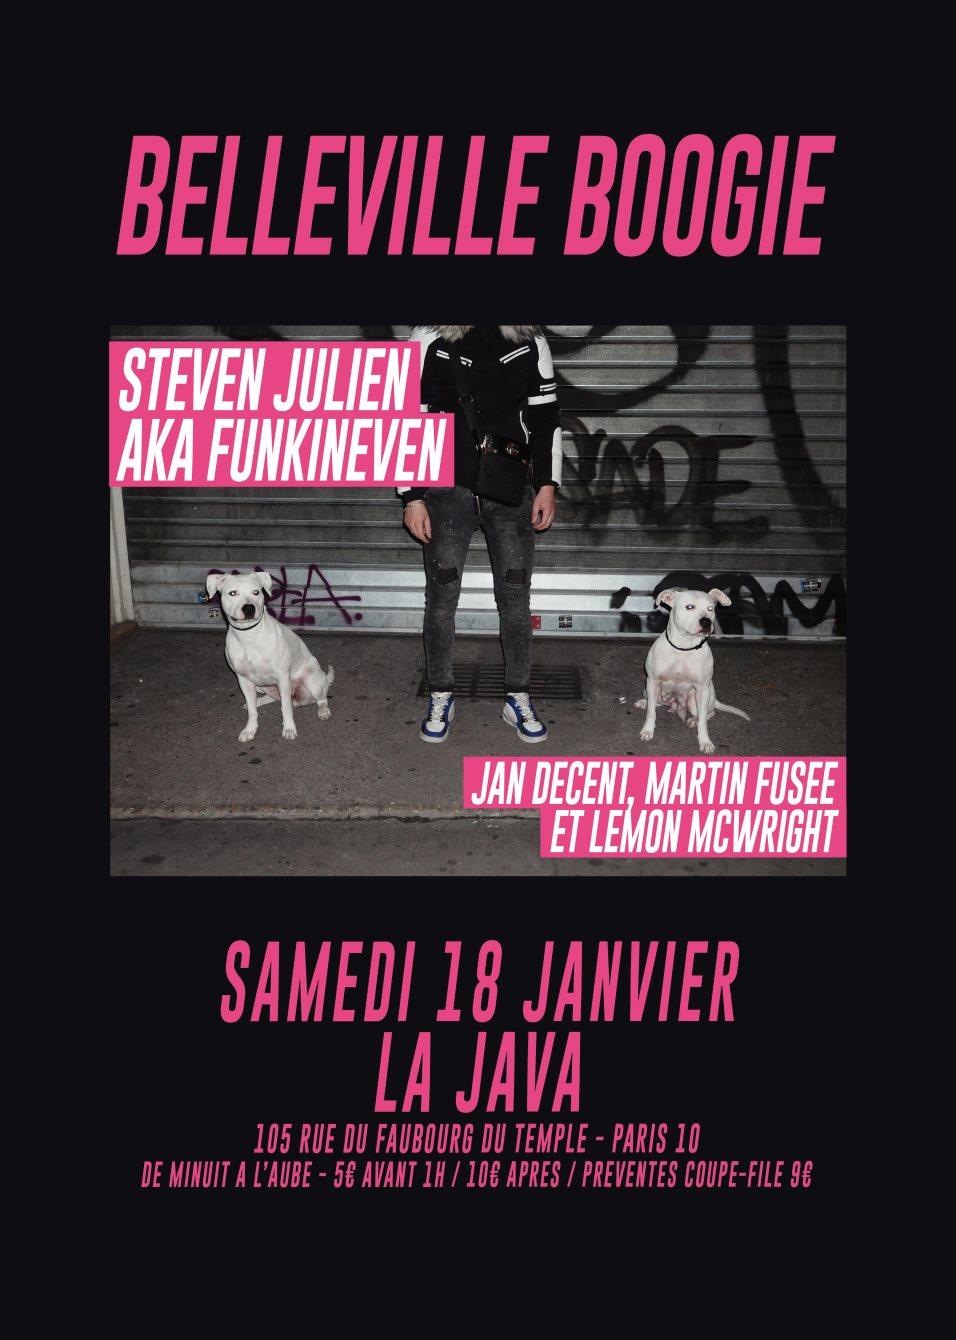 Belleville Boogie: Steven Julien aka FunkinEven & Résidents - Flyer back